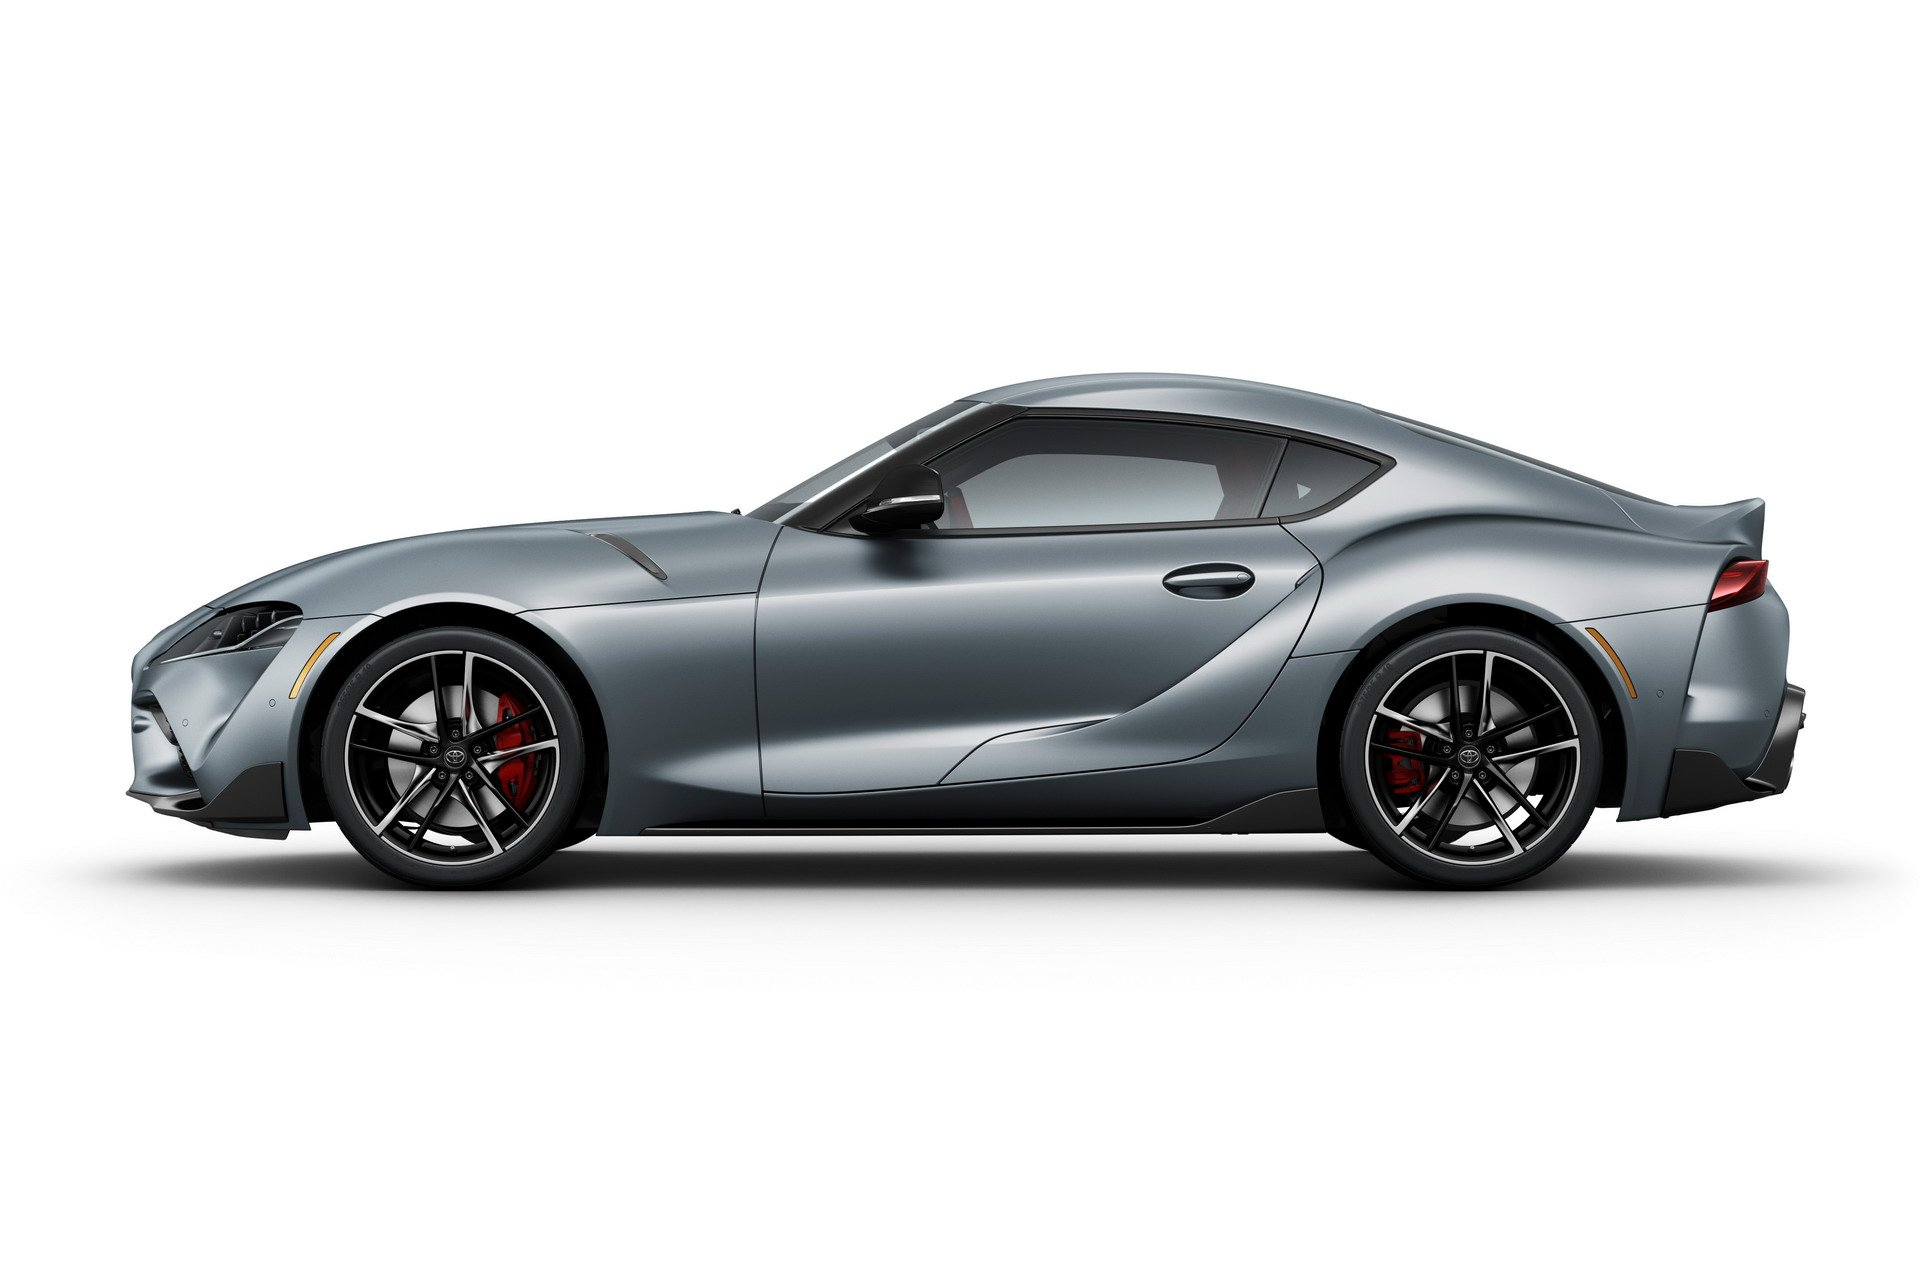 2020 Toyota Gr Supra Performance Line Trd Concept Looks